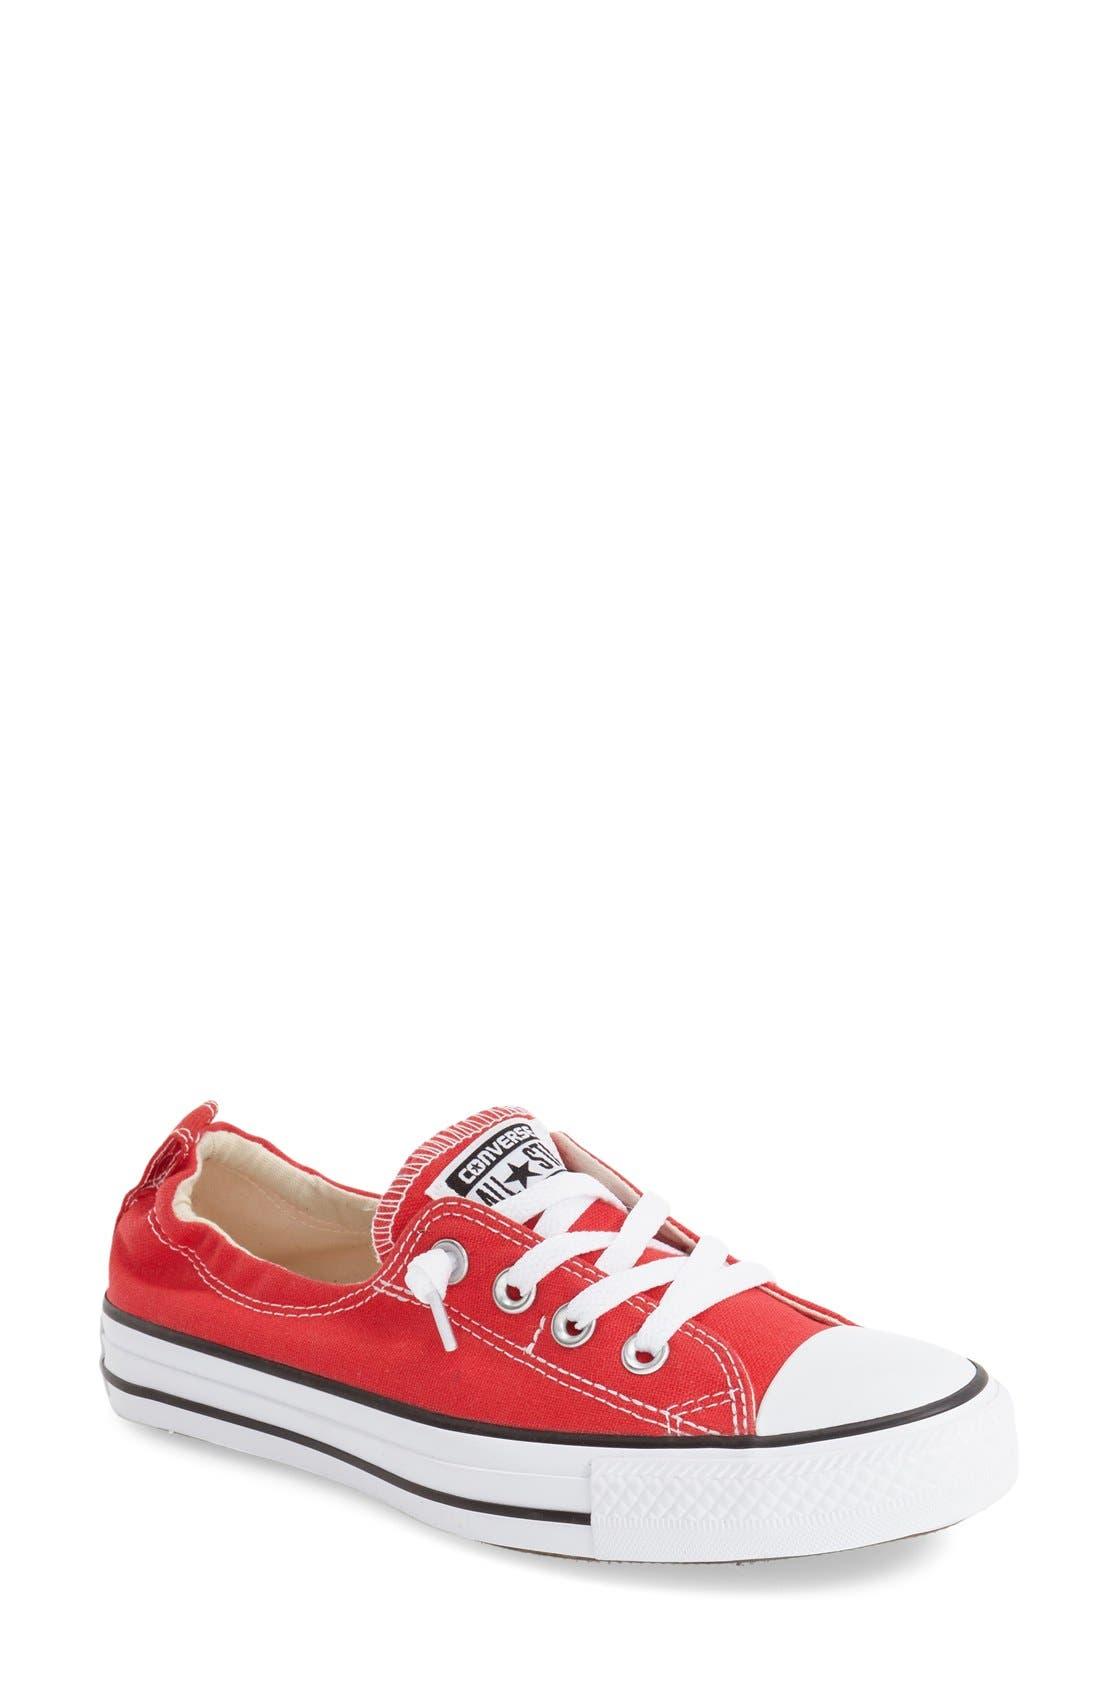 Chuck Taylor<sup>®</sup> Shoreline Sneaker,                             Main thumbnail 1, color,